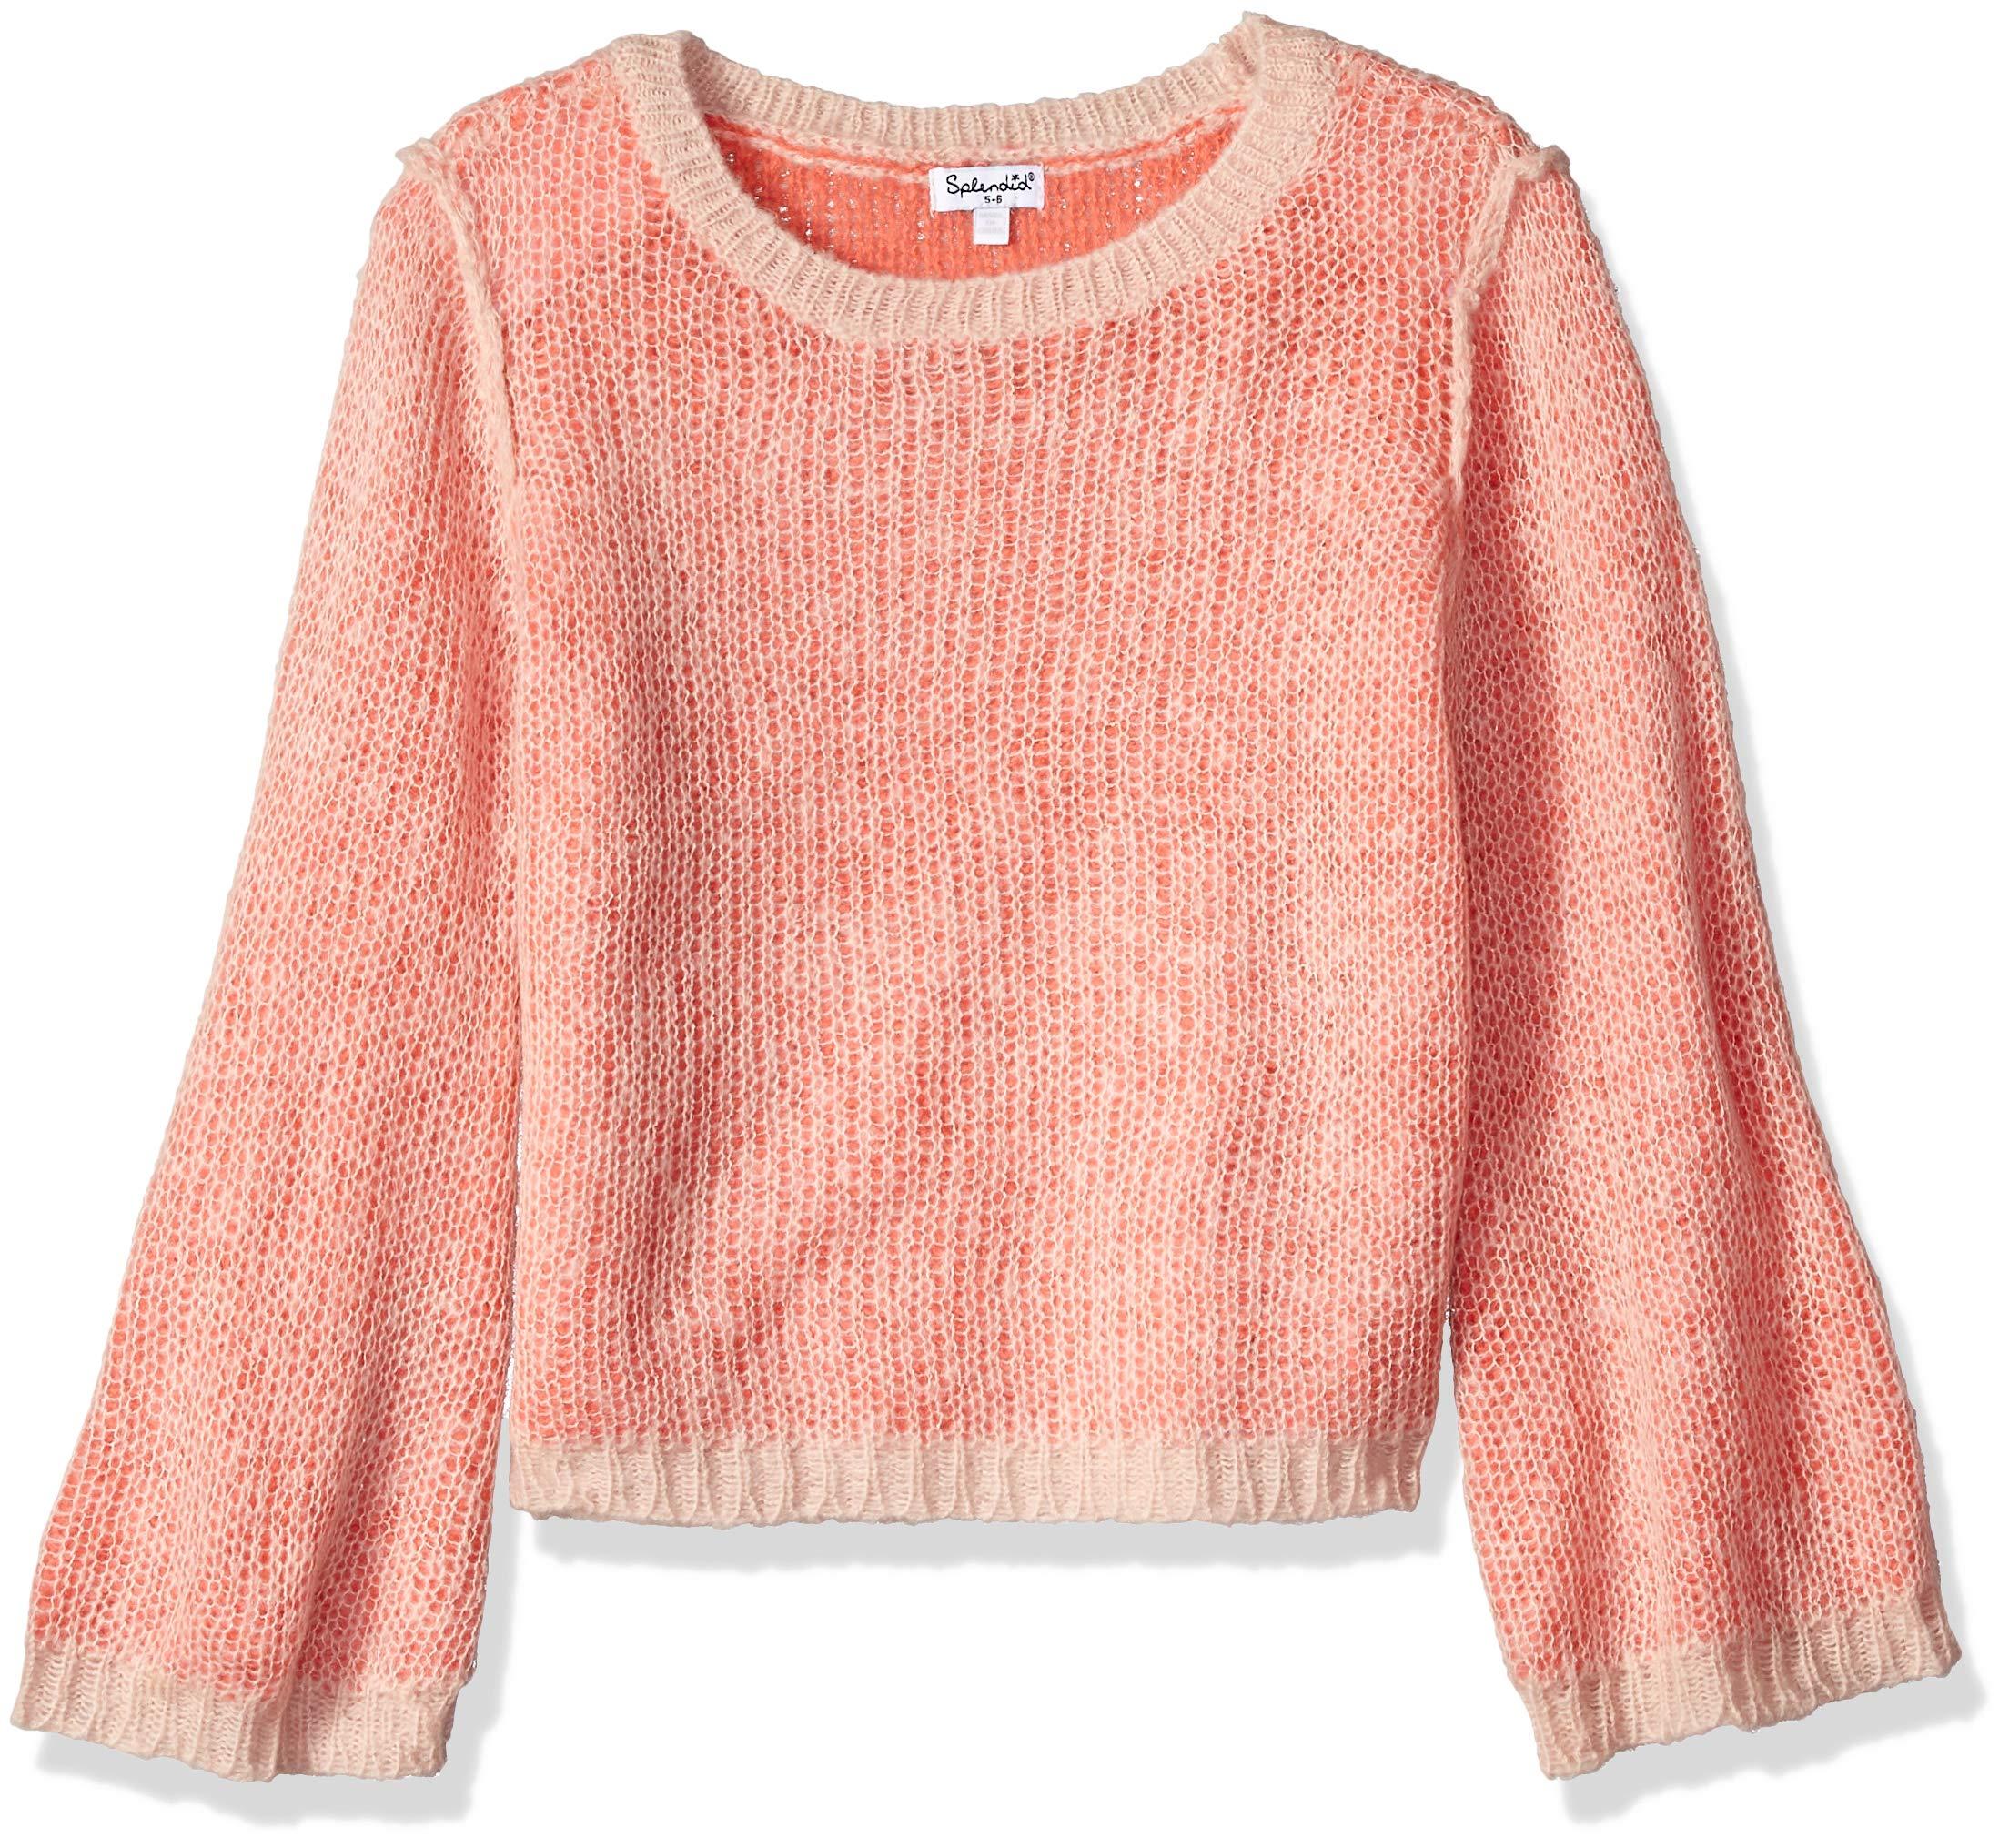 Splendid Girls' Little Sweater, Strawberry ice, 5/6